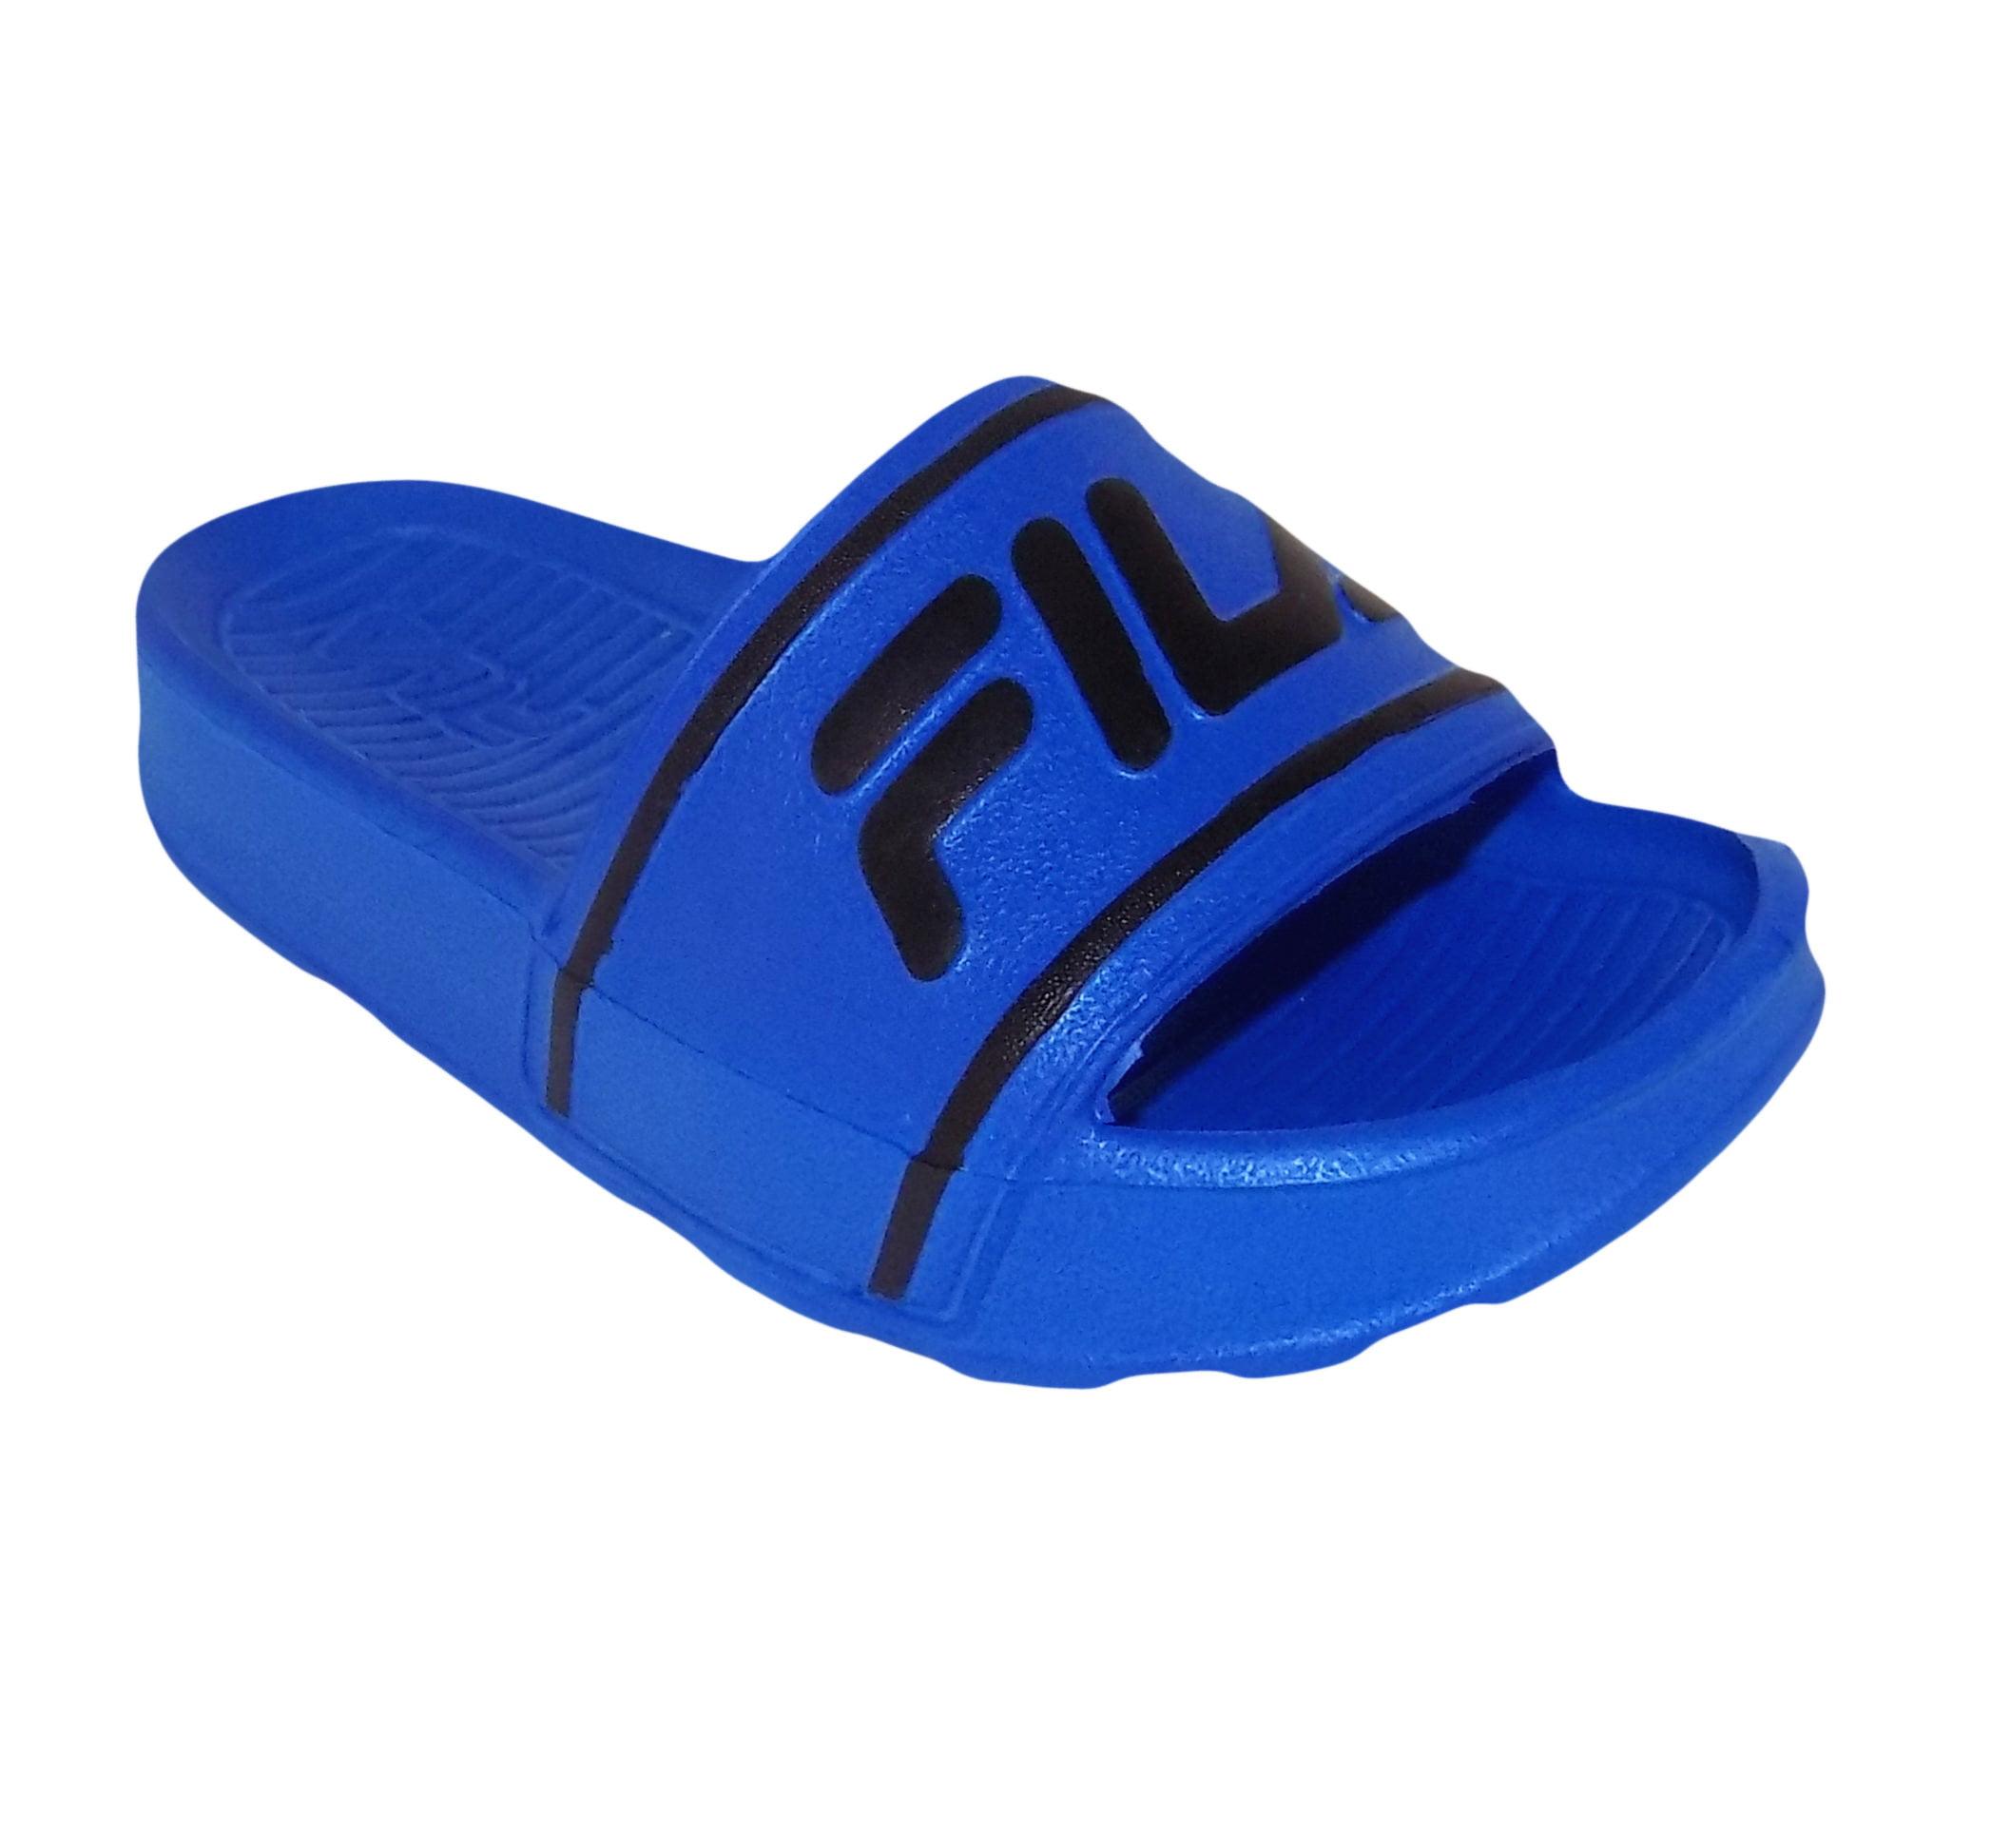 Fila Sleek Slide ST Little Boys Blue Athletic Sport Slide Sandals (11 US Little Kid) by